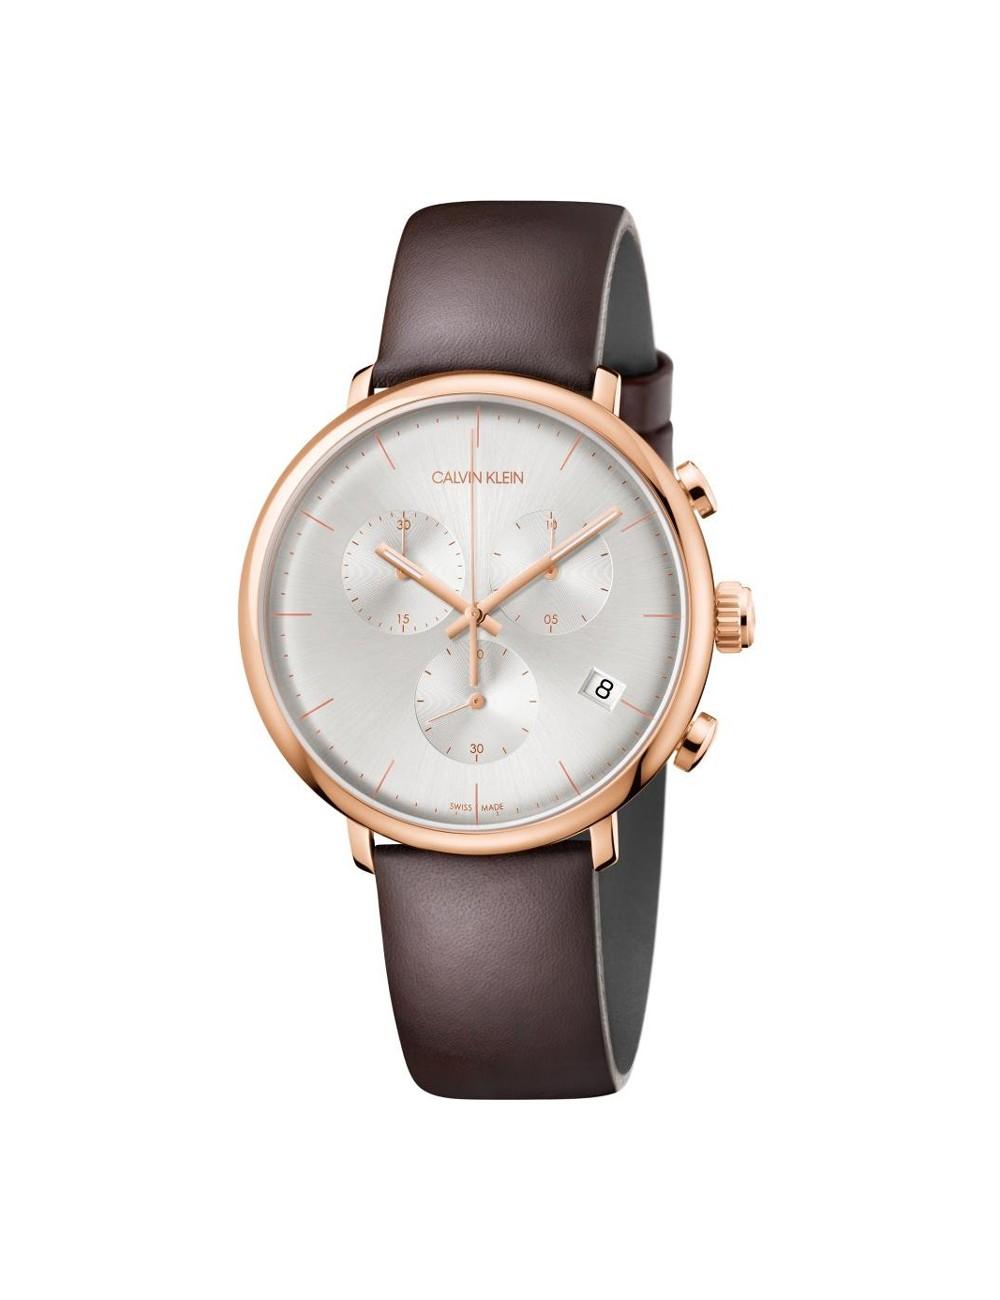 Calvin Klein High Noon K8M276G6 Mens Watch Chronograph